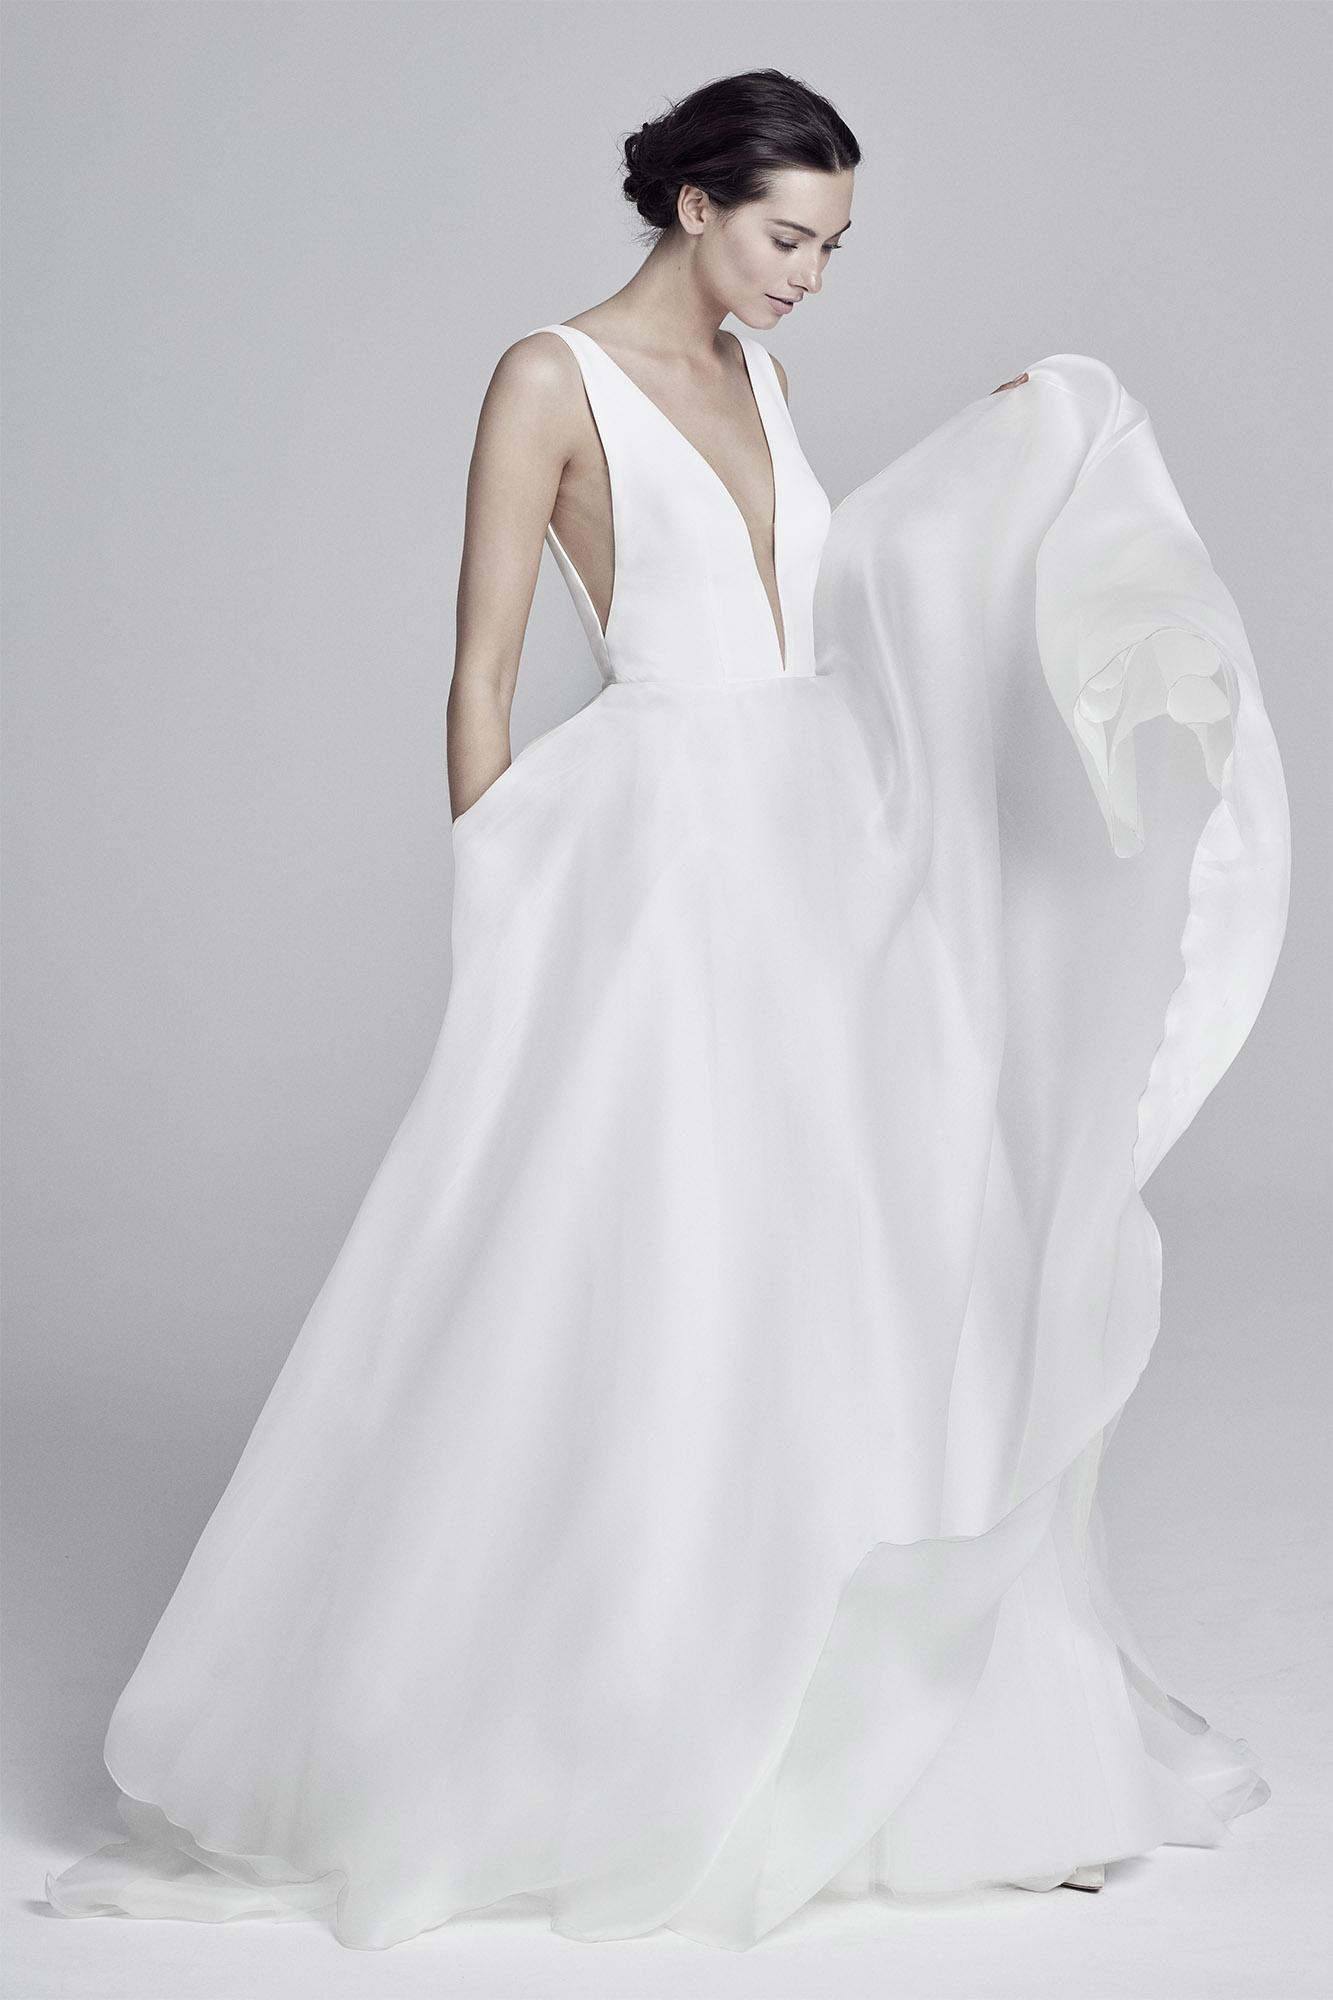 serrano-lookbook-collection2019-weddingdressesuk-designerSuzanneNeville.jpg